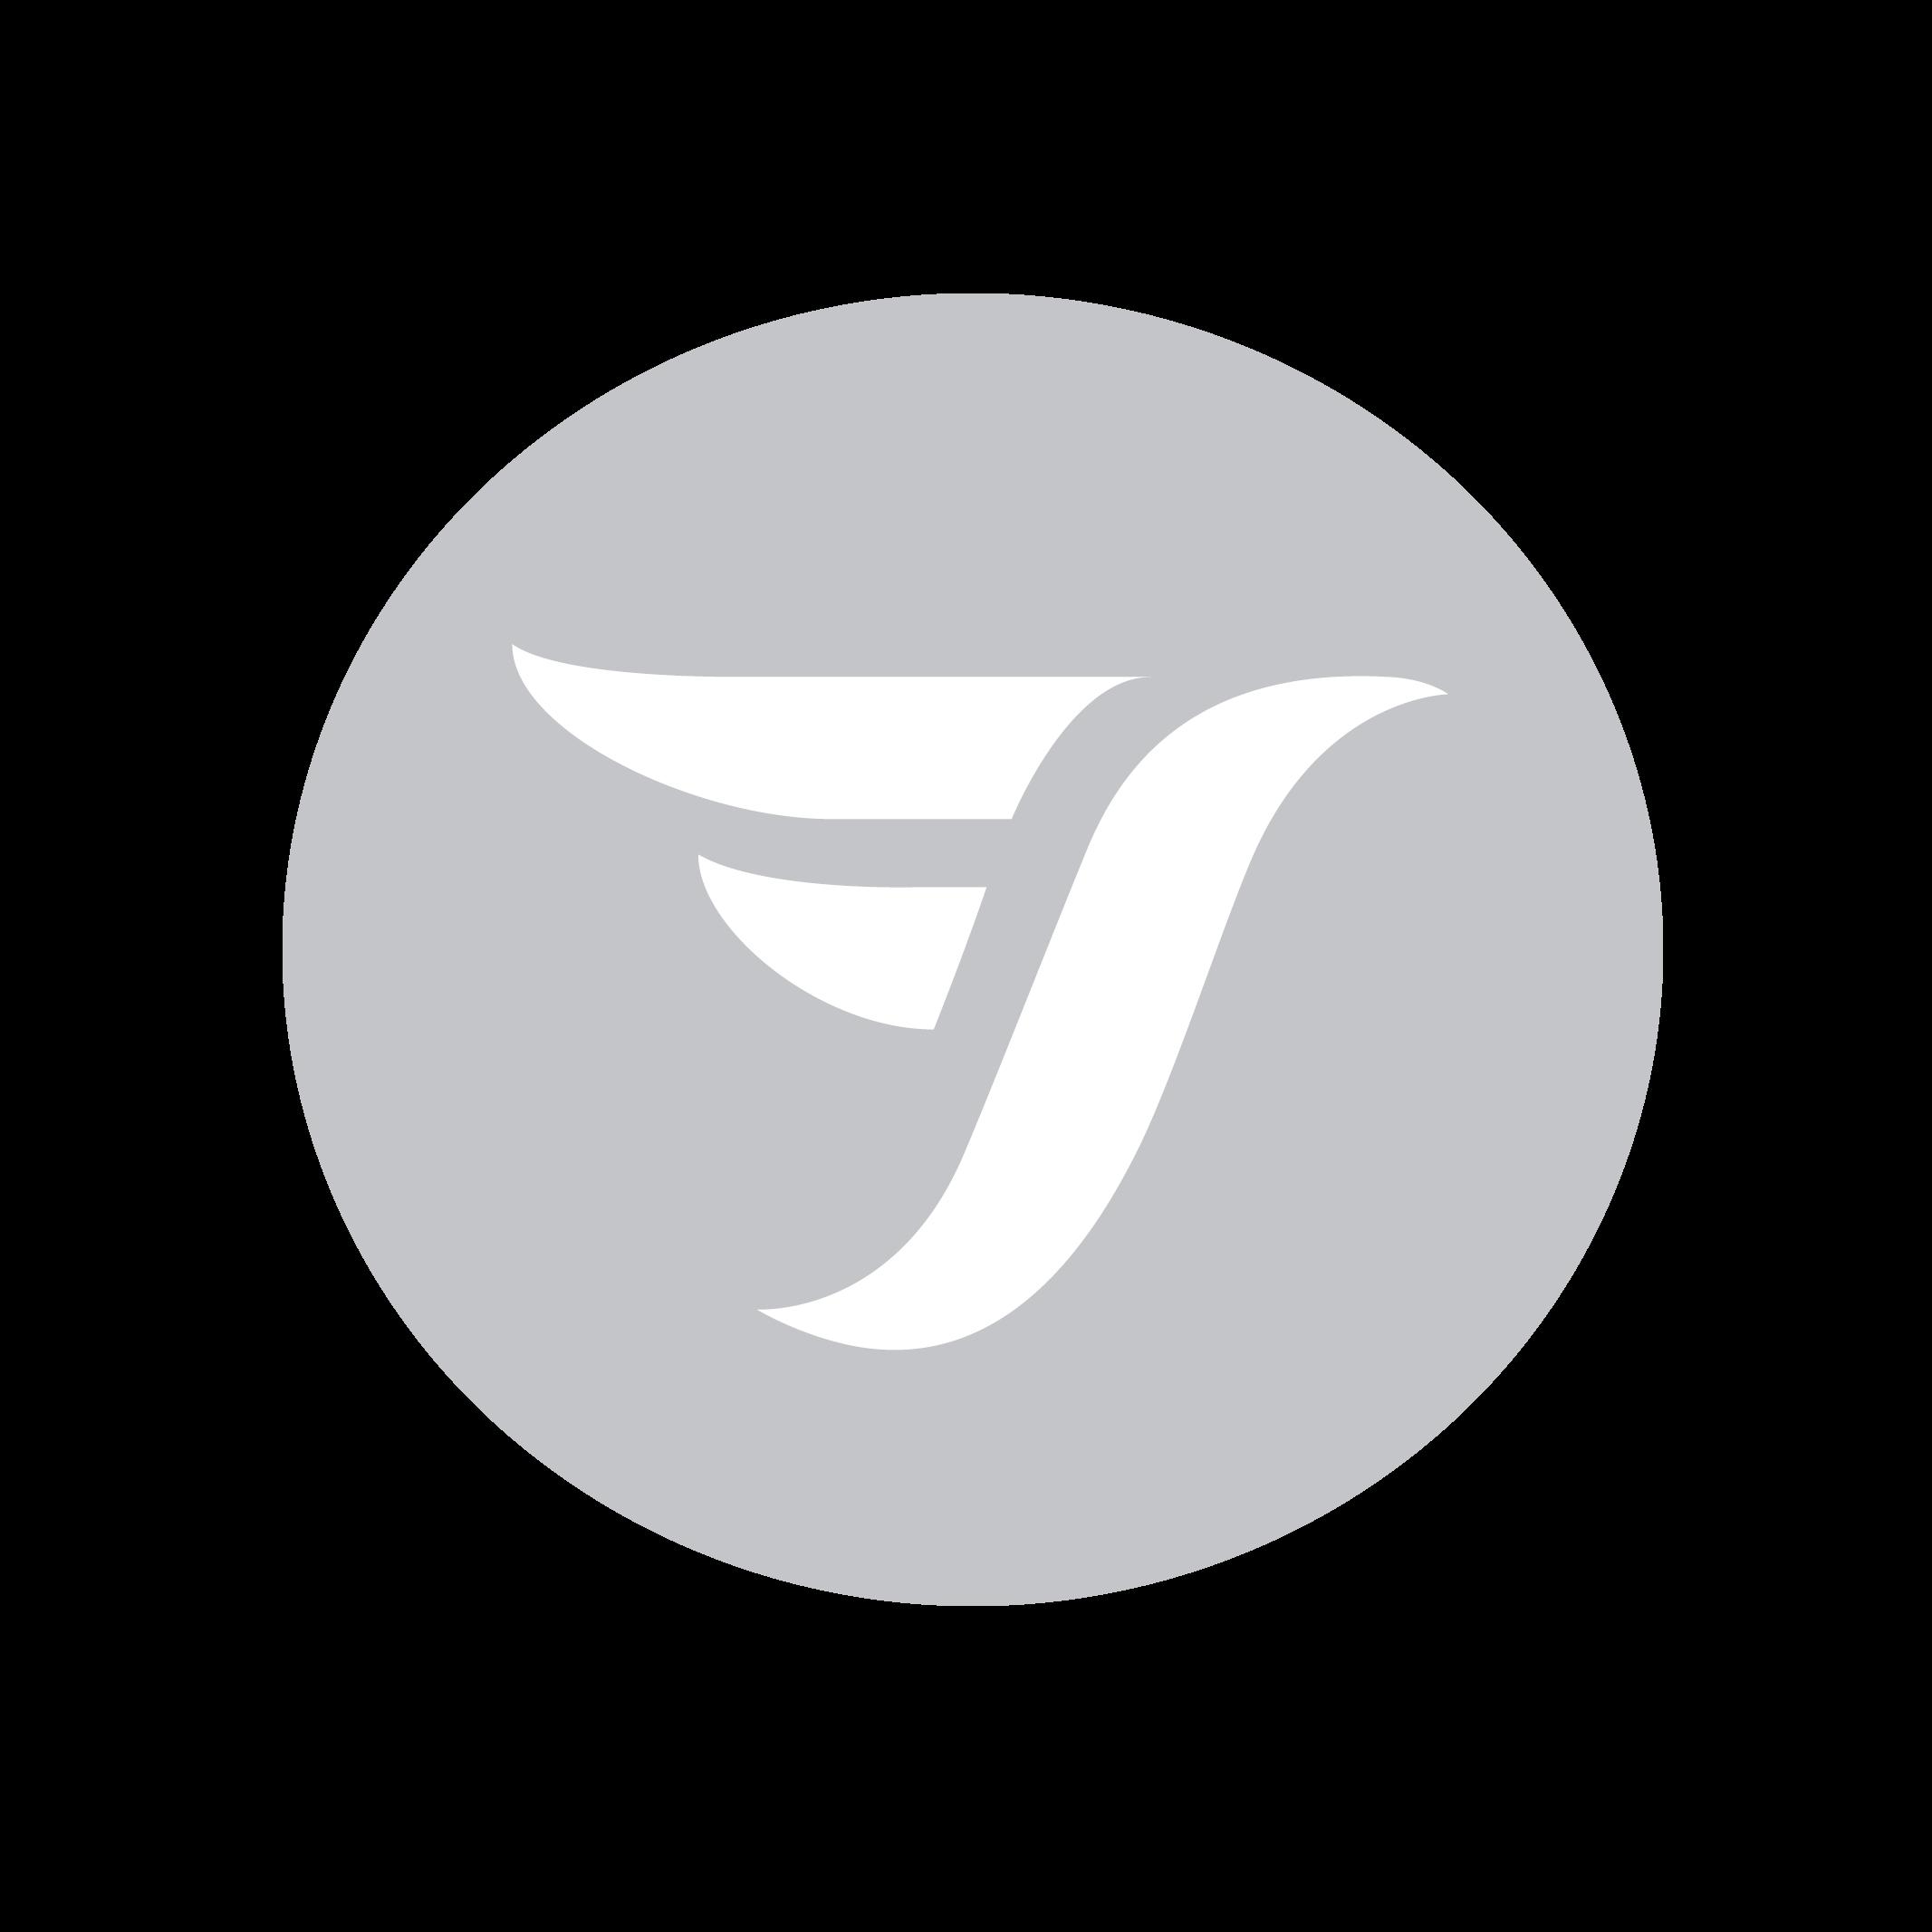 silverpass_symbol.png